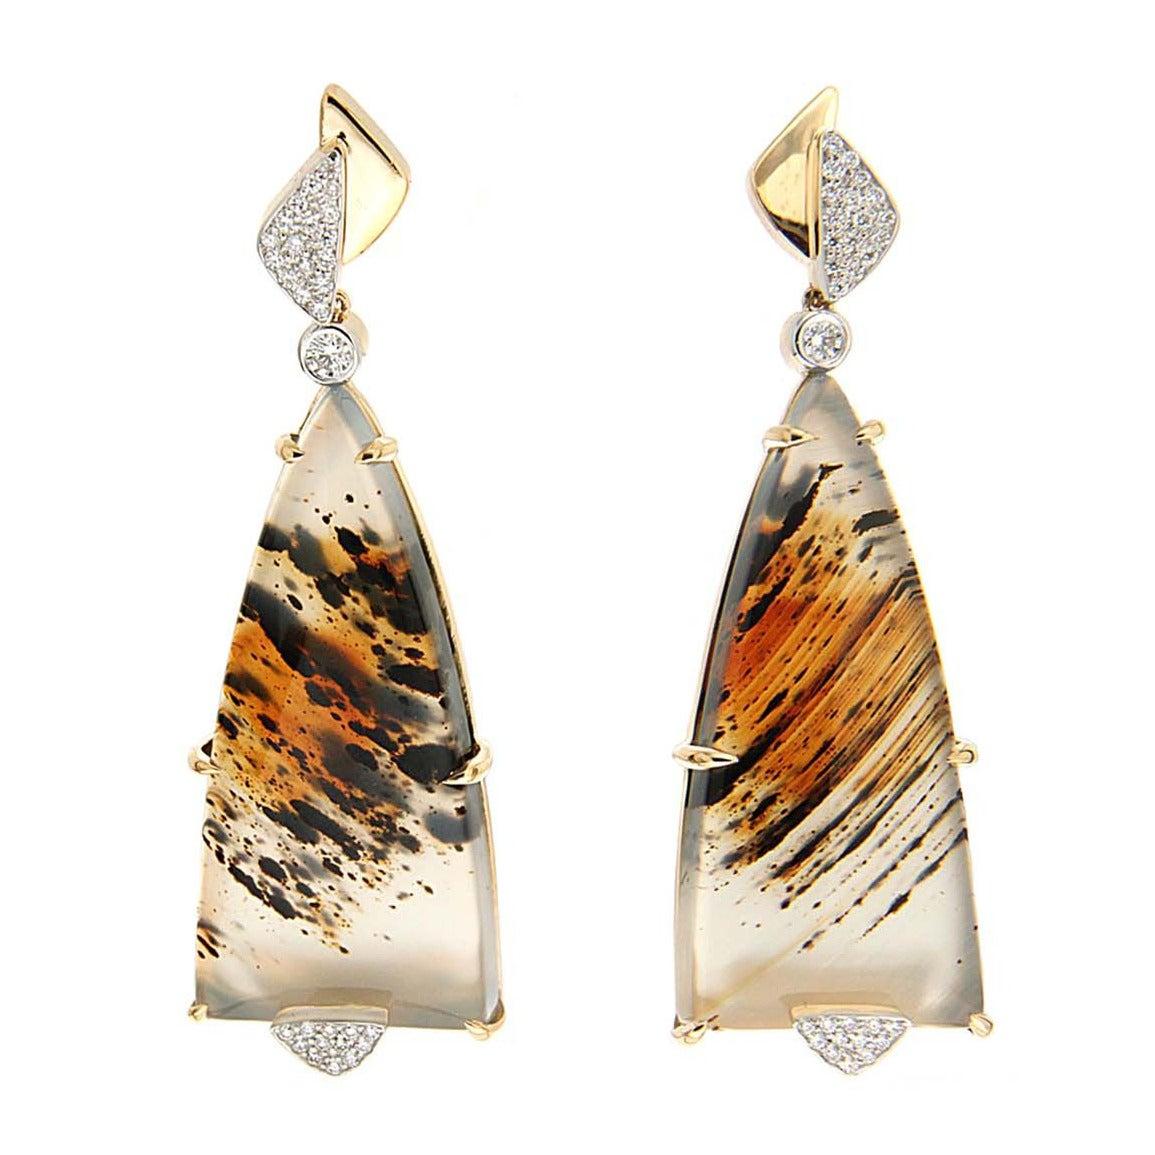 Montana Agate Diamond Gold Earrings